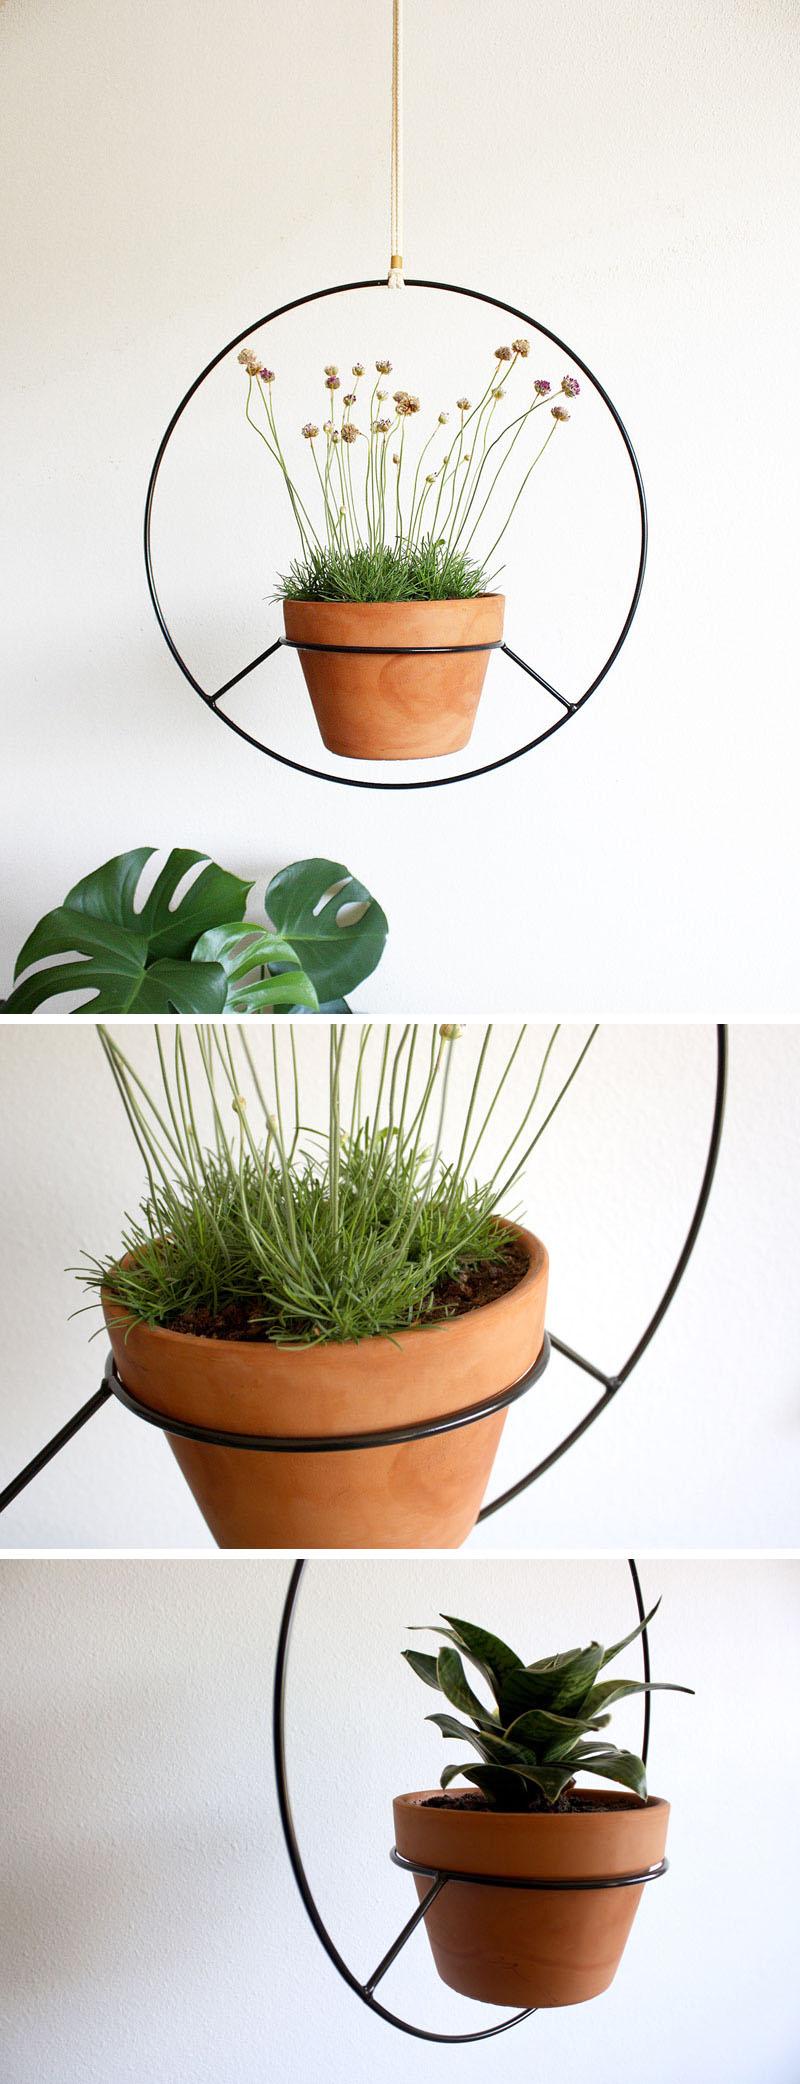 53 Indoor Garden Idea Hang Your Plants From The Ceiling